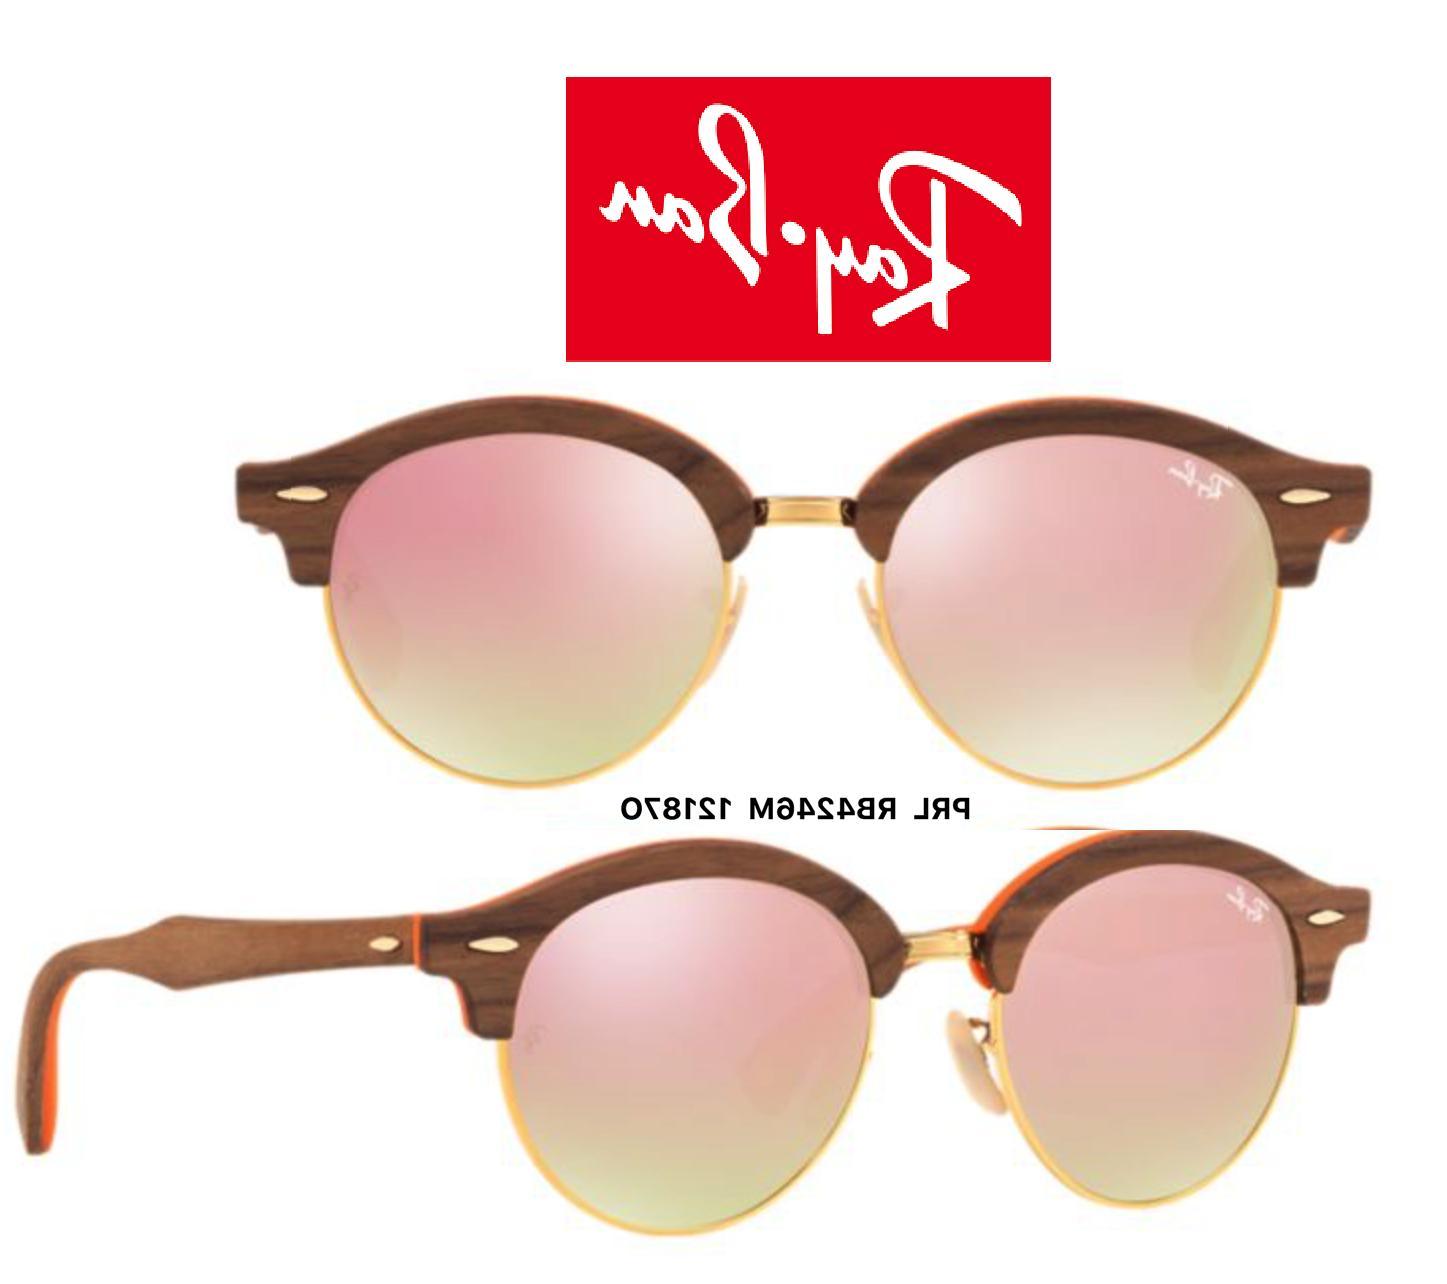 Wood Sunglasses Authentic